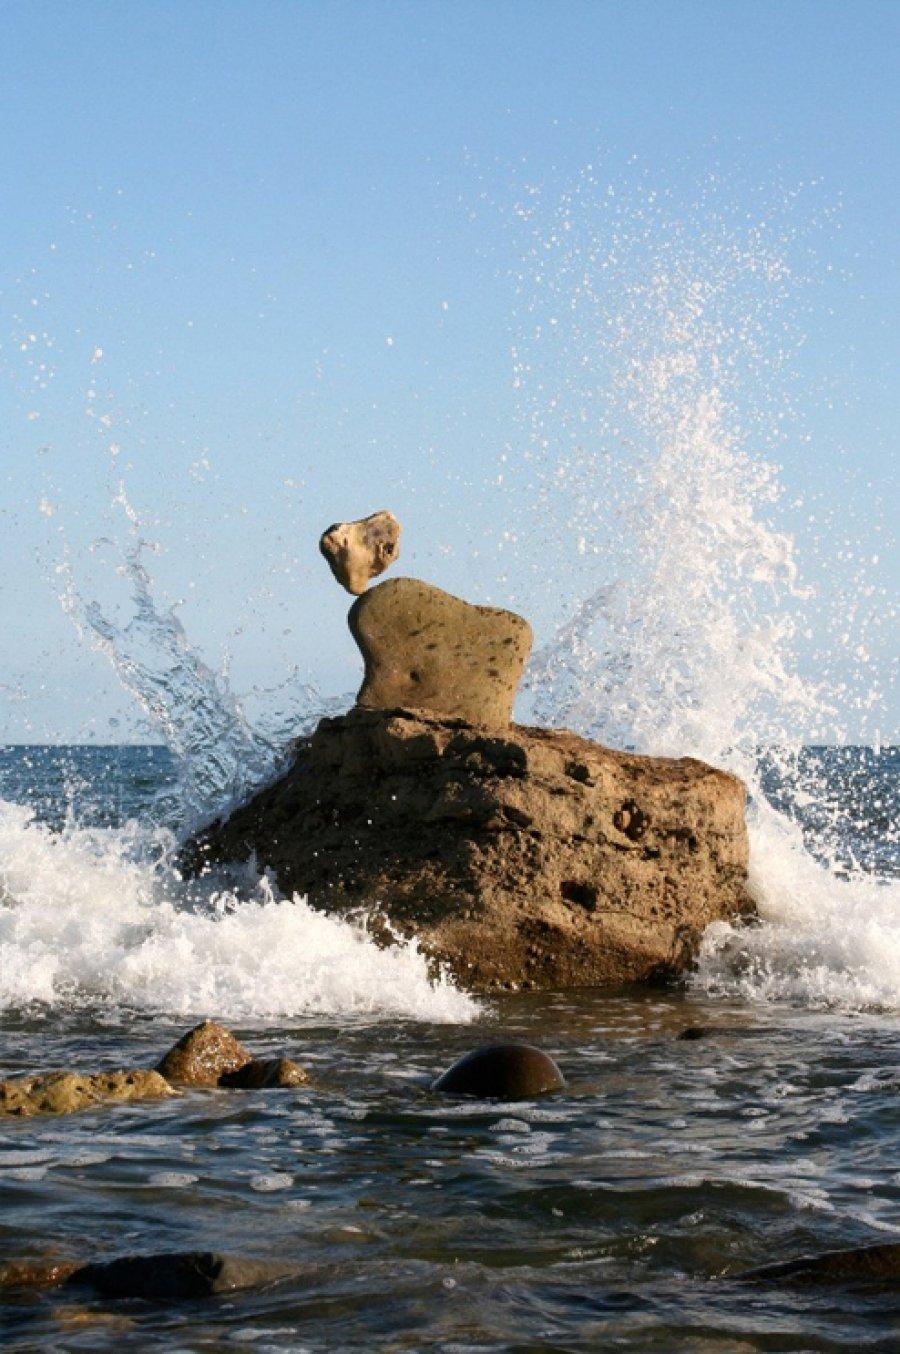 Balancing Stones 3